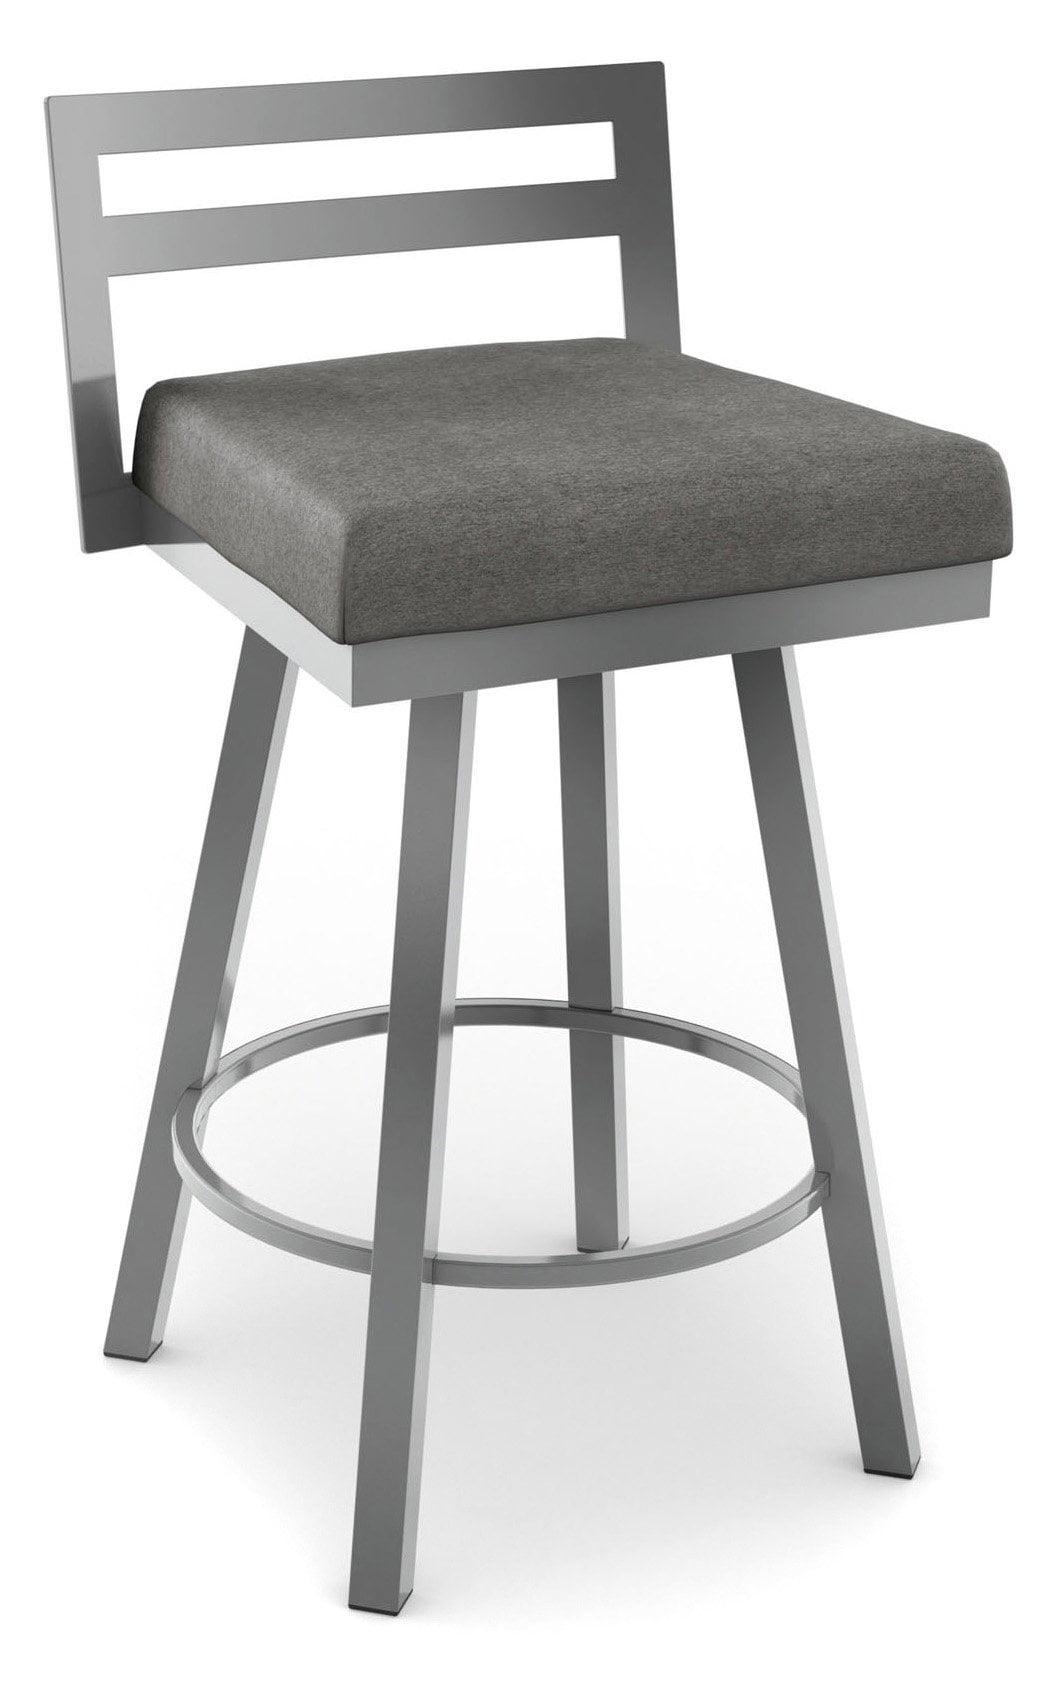 Fantastic Amisco Derek Swivel Counter Stool 26 In Bralicious Painted Fabric Chair Ideas Braliciousco